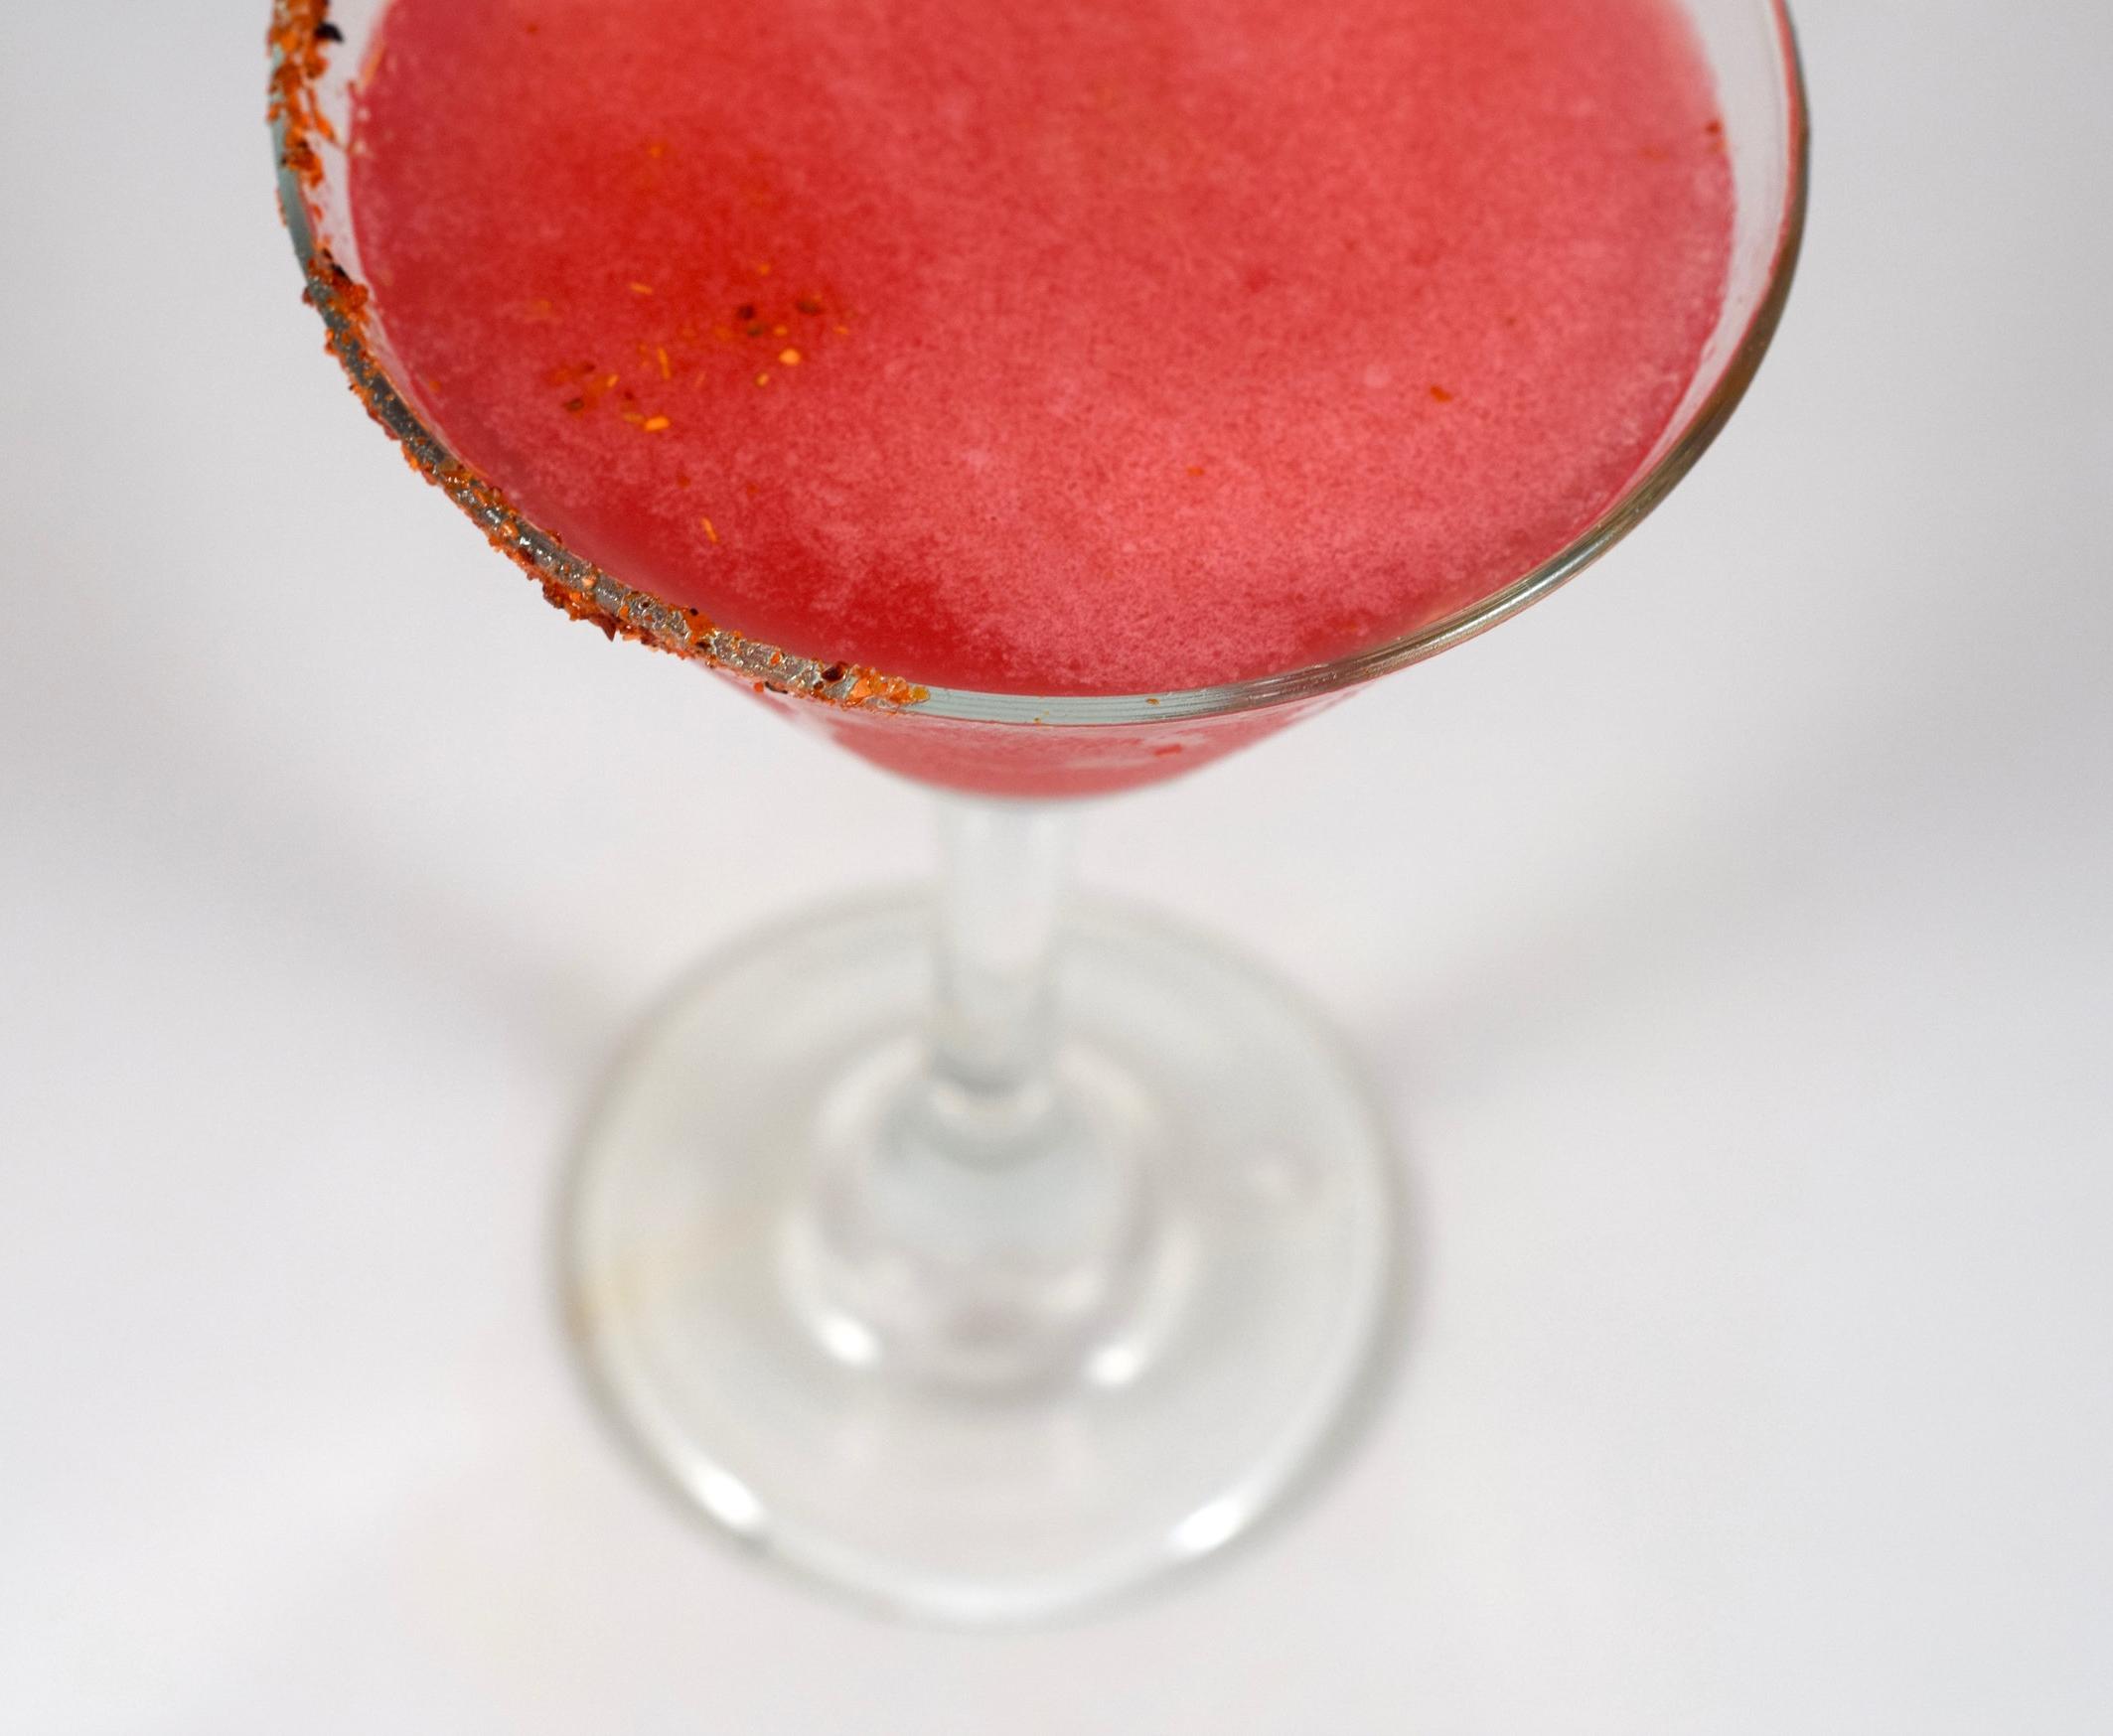 ALMA ROSA - 2 oz tequila or mezcal3/4 oz nostrum strawberry hibiscus jalapeno shrub3/4 oz fresh lime juice1 barspoon agave nectarShake with ice and strain.